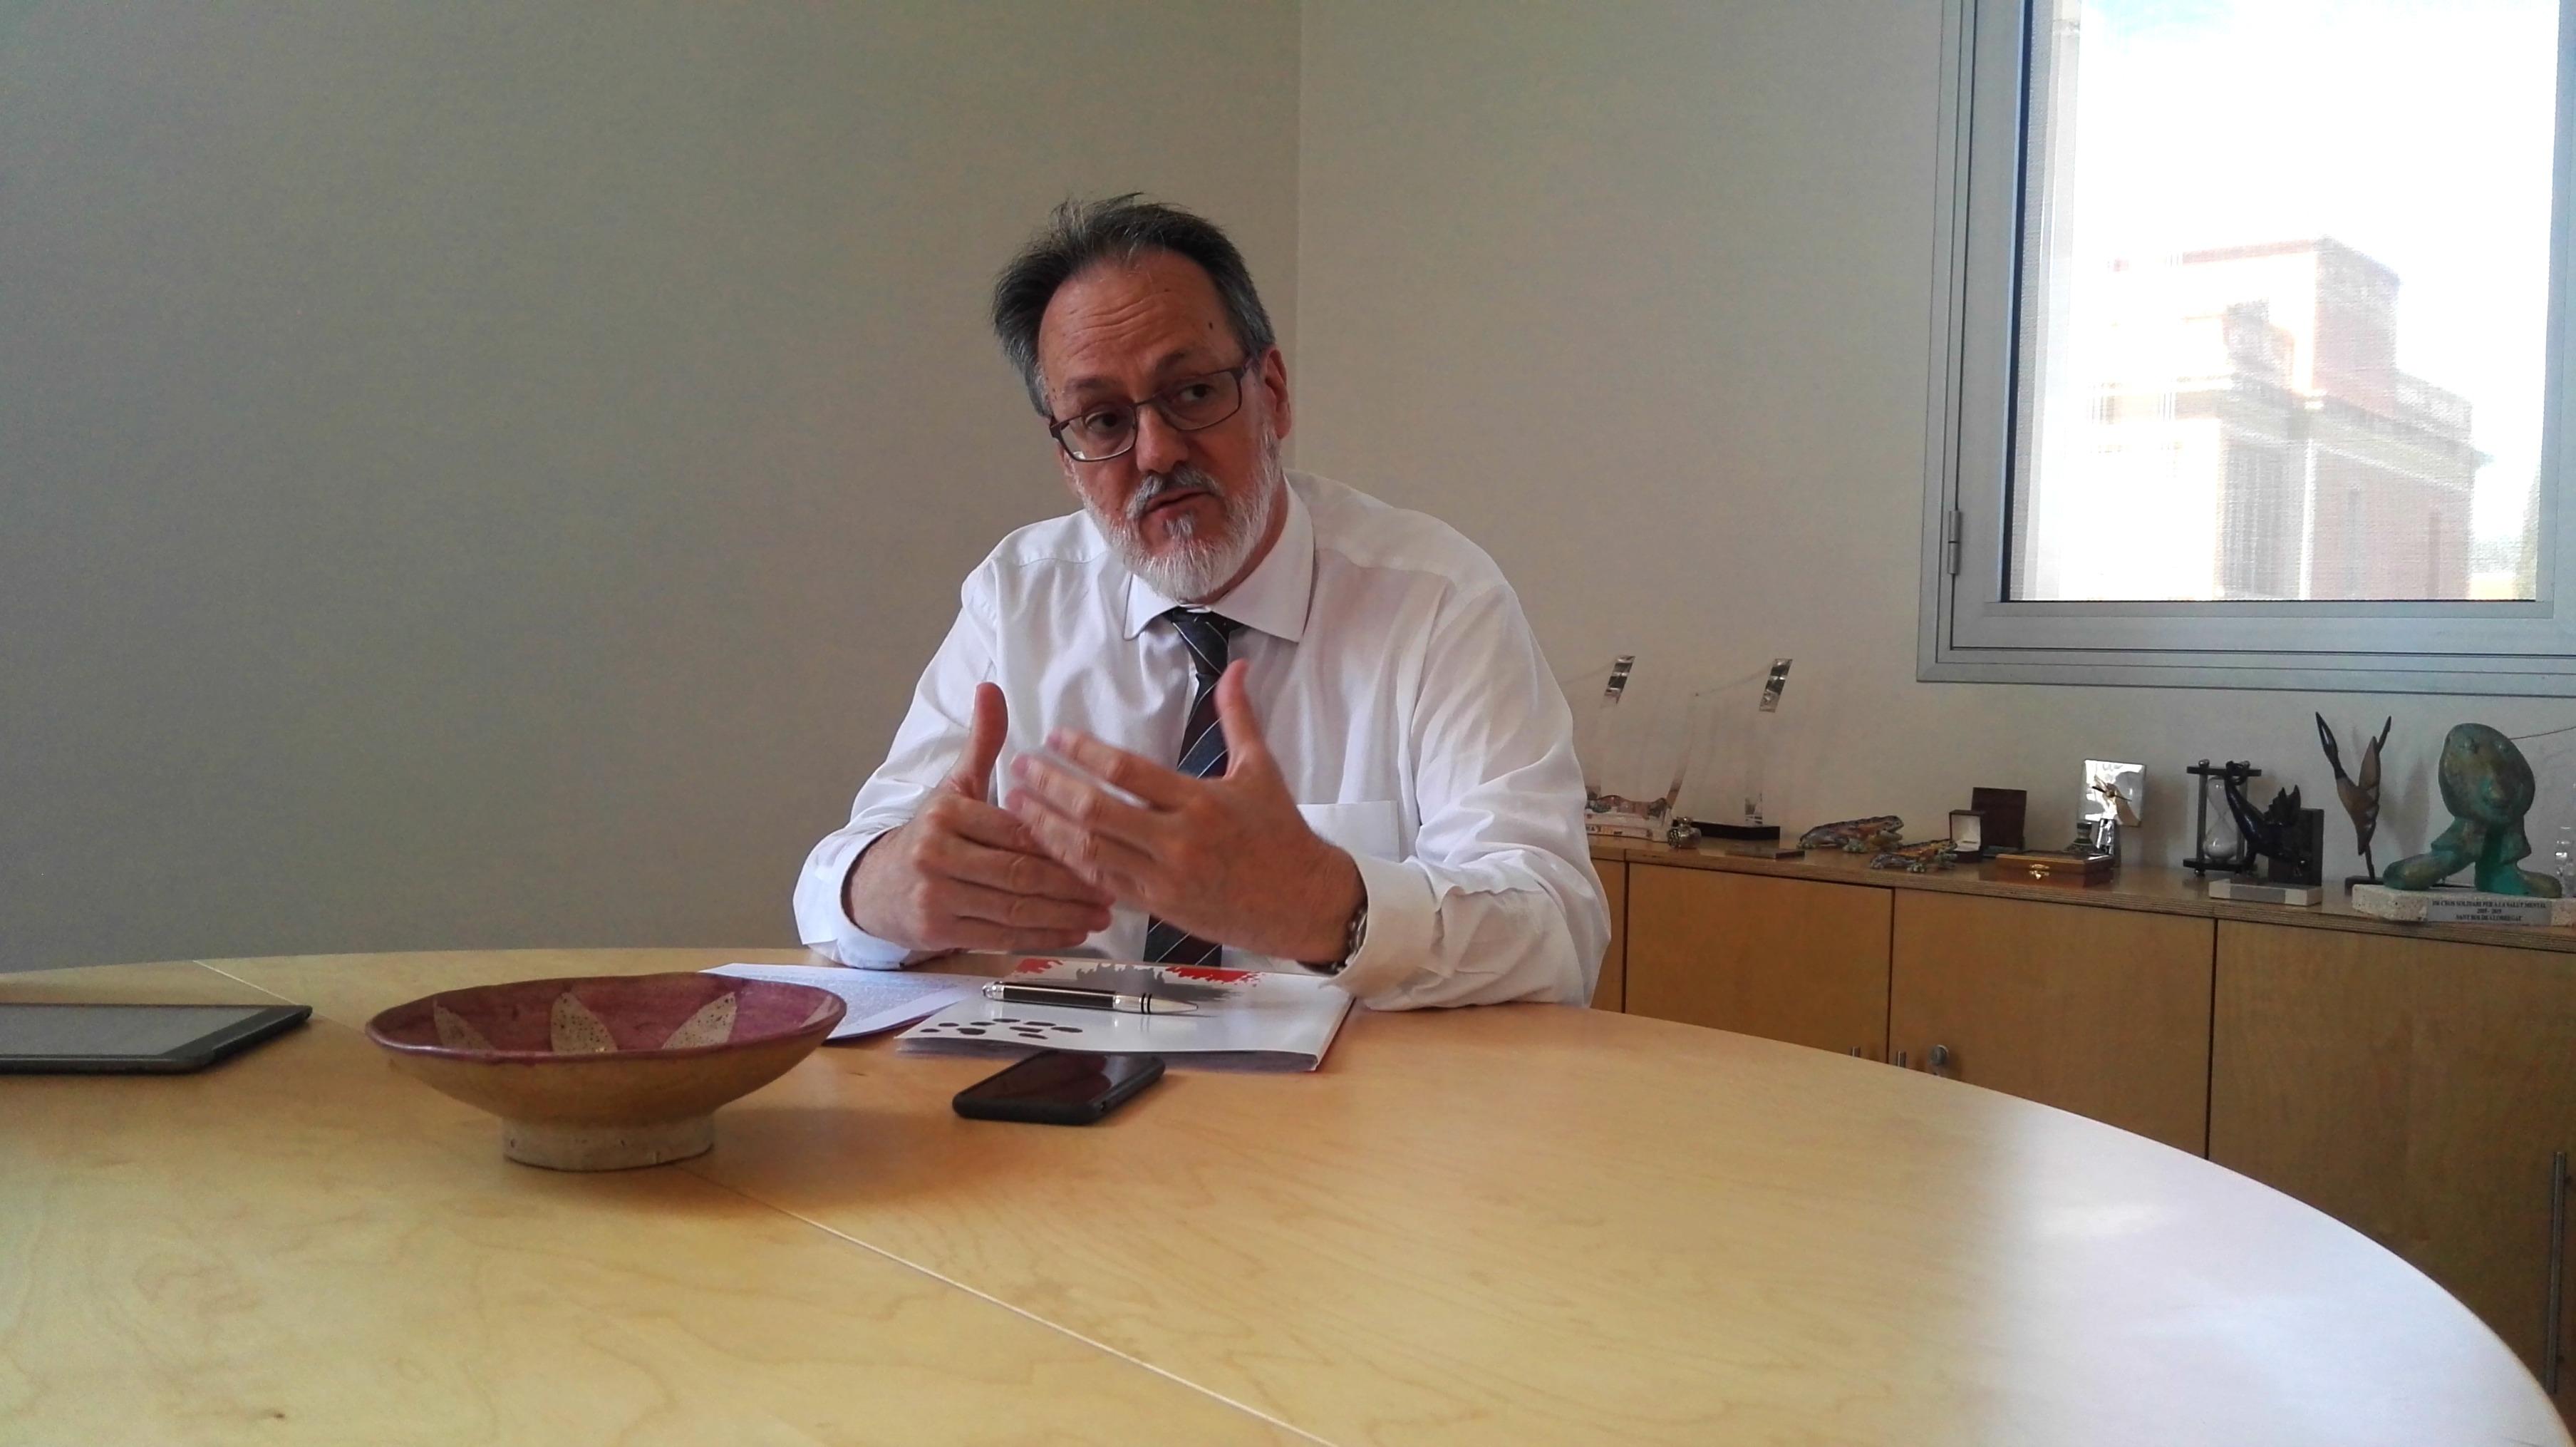 Enric Mangas Monge